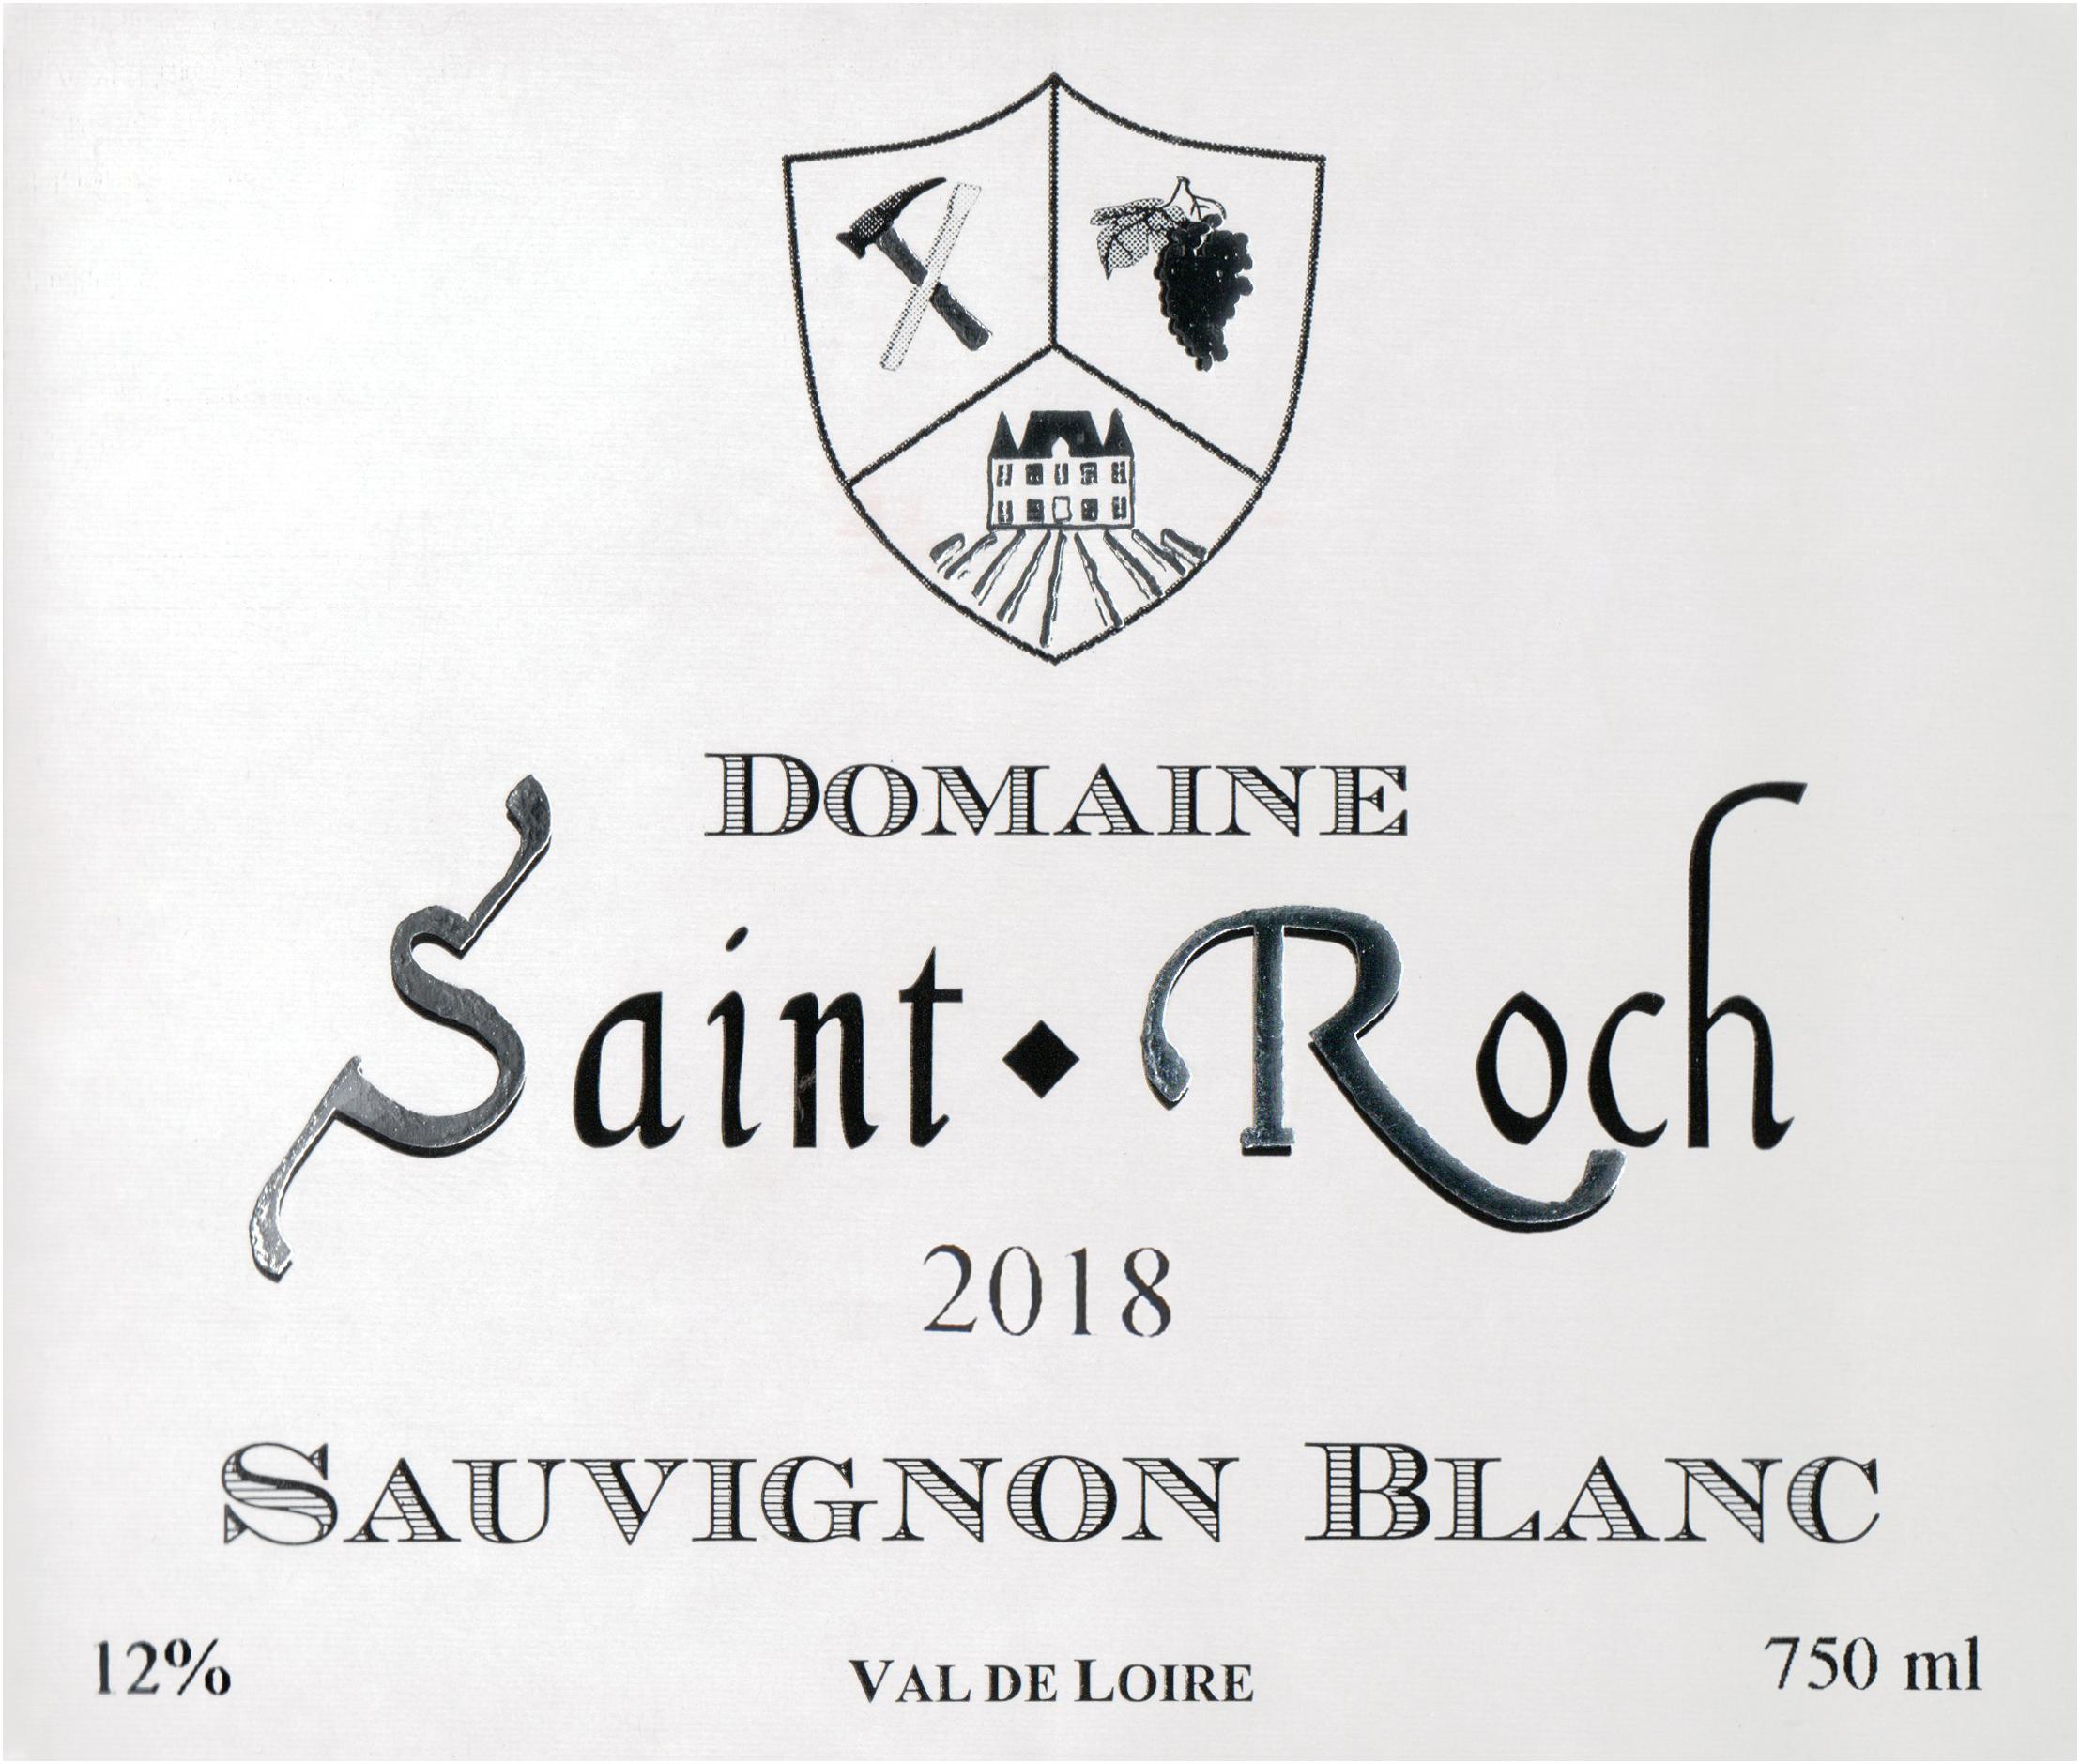 Saint Roch Touraine Sauvignon Blanc 2018